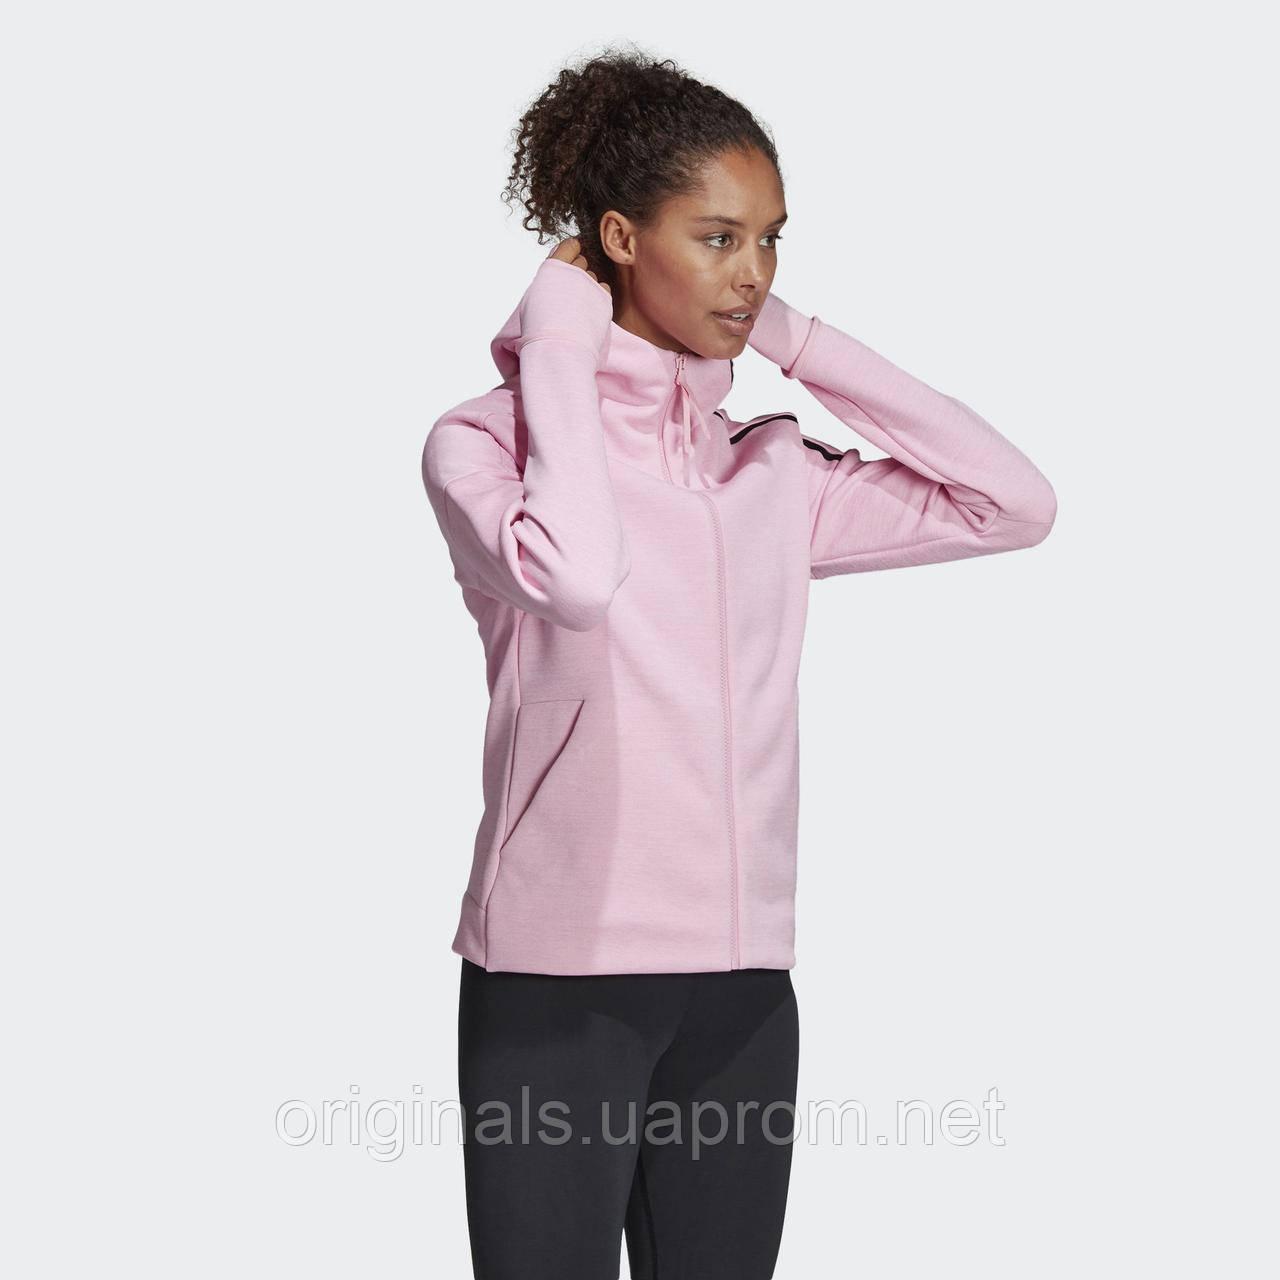 Женская толстовка Adidas Z.N.E. Fast Release W DT9397